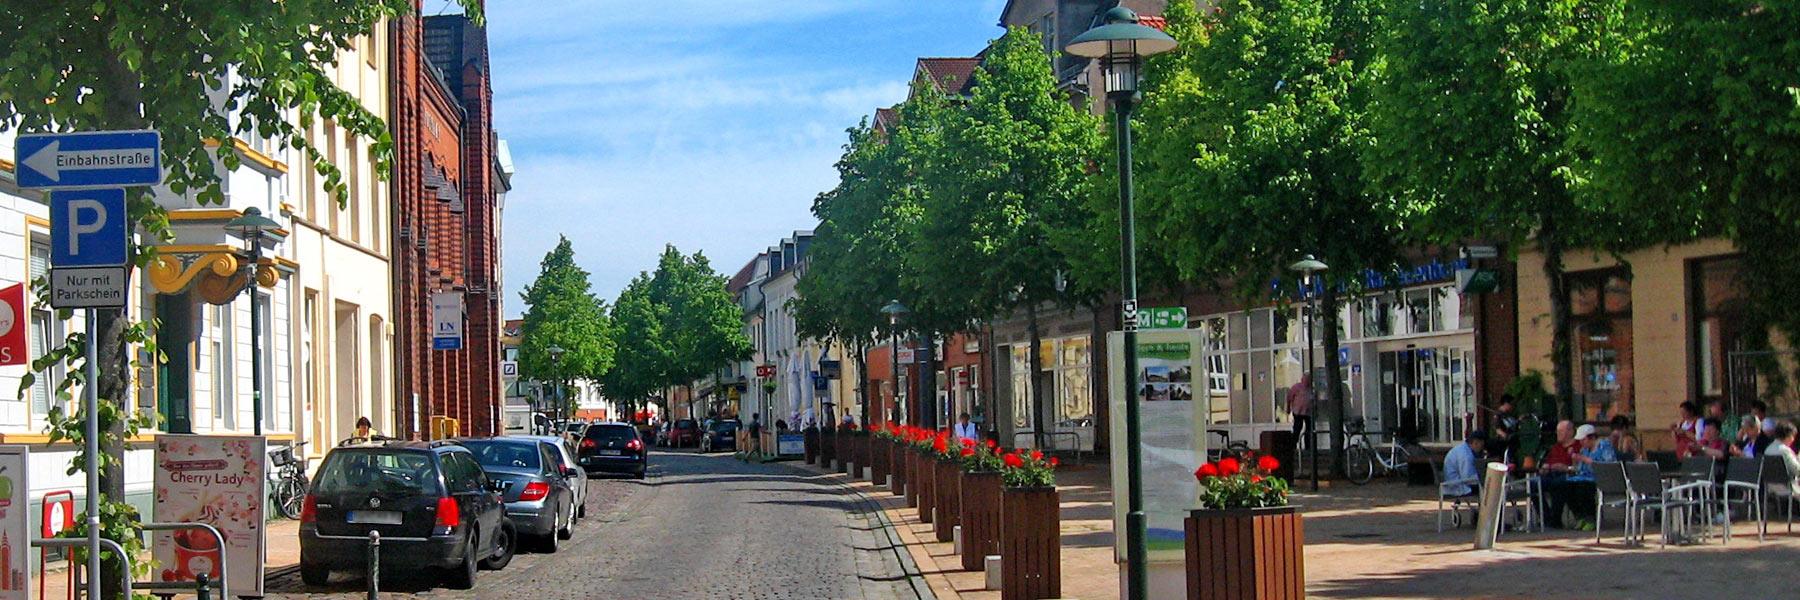 Innenstadt - Grevesmühlen